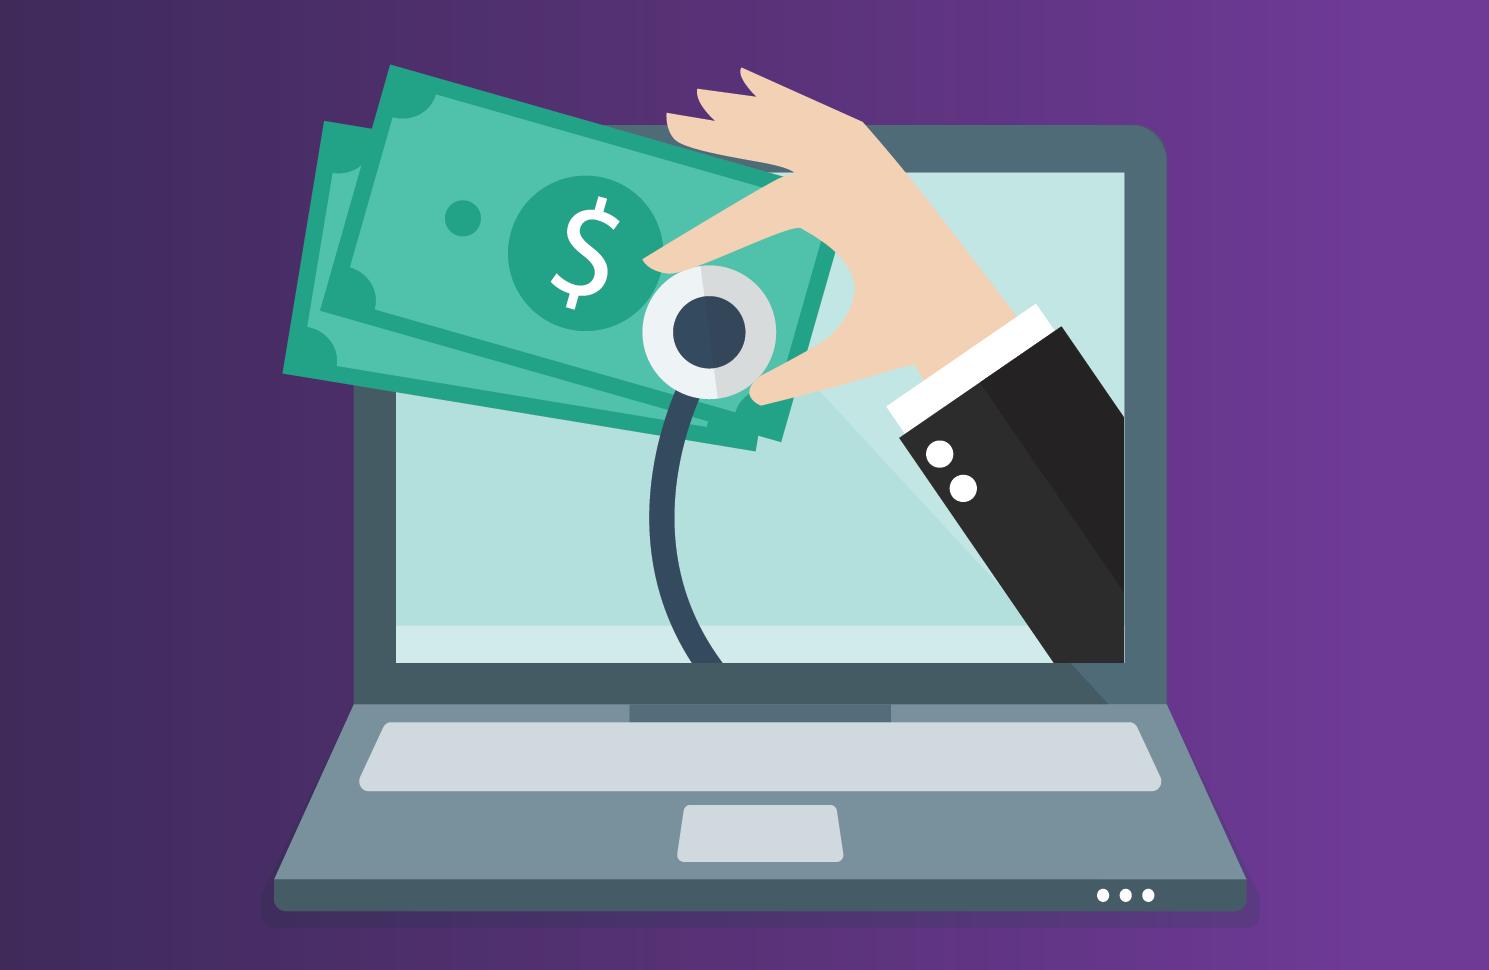 Venminder Webinar Reviewing Your Vendor's Financial Health